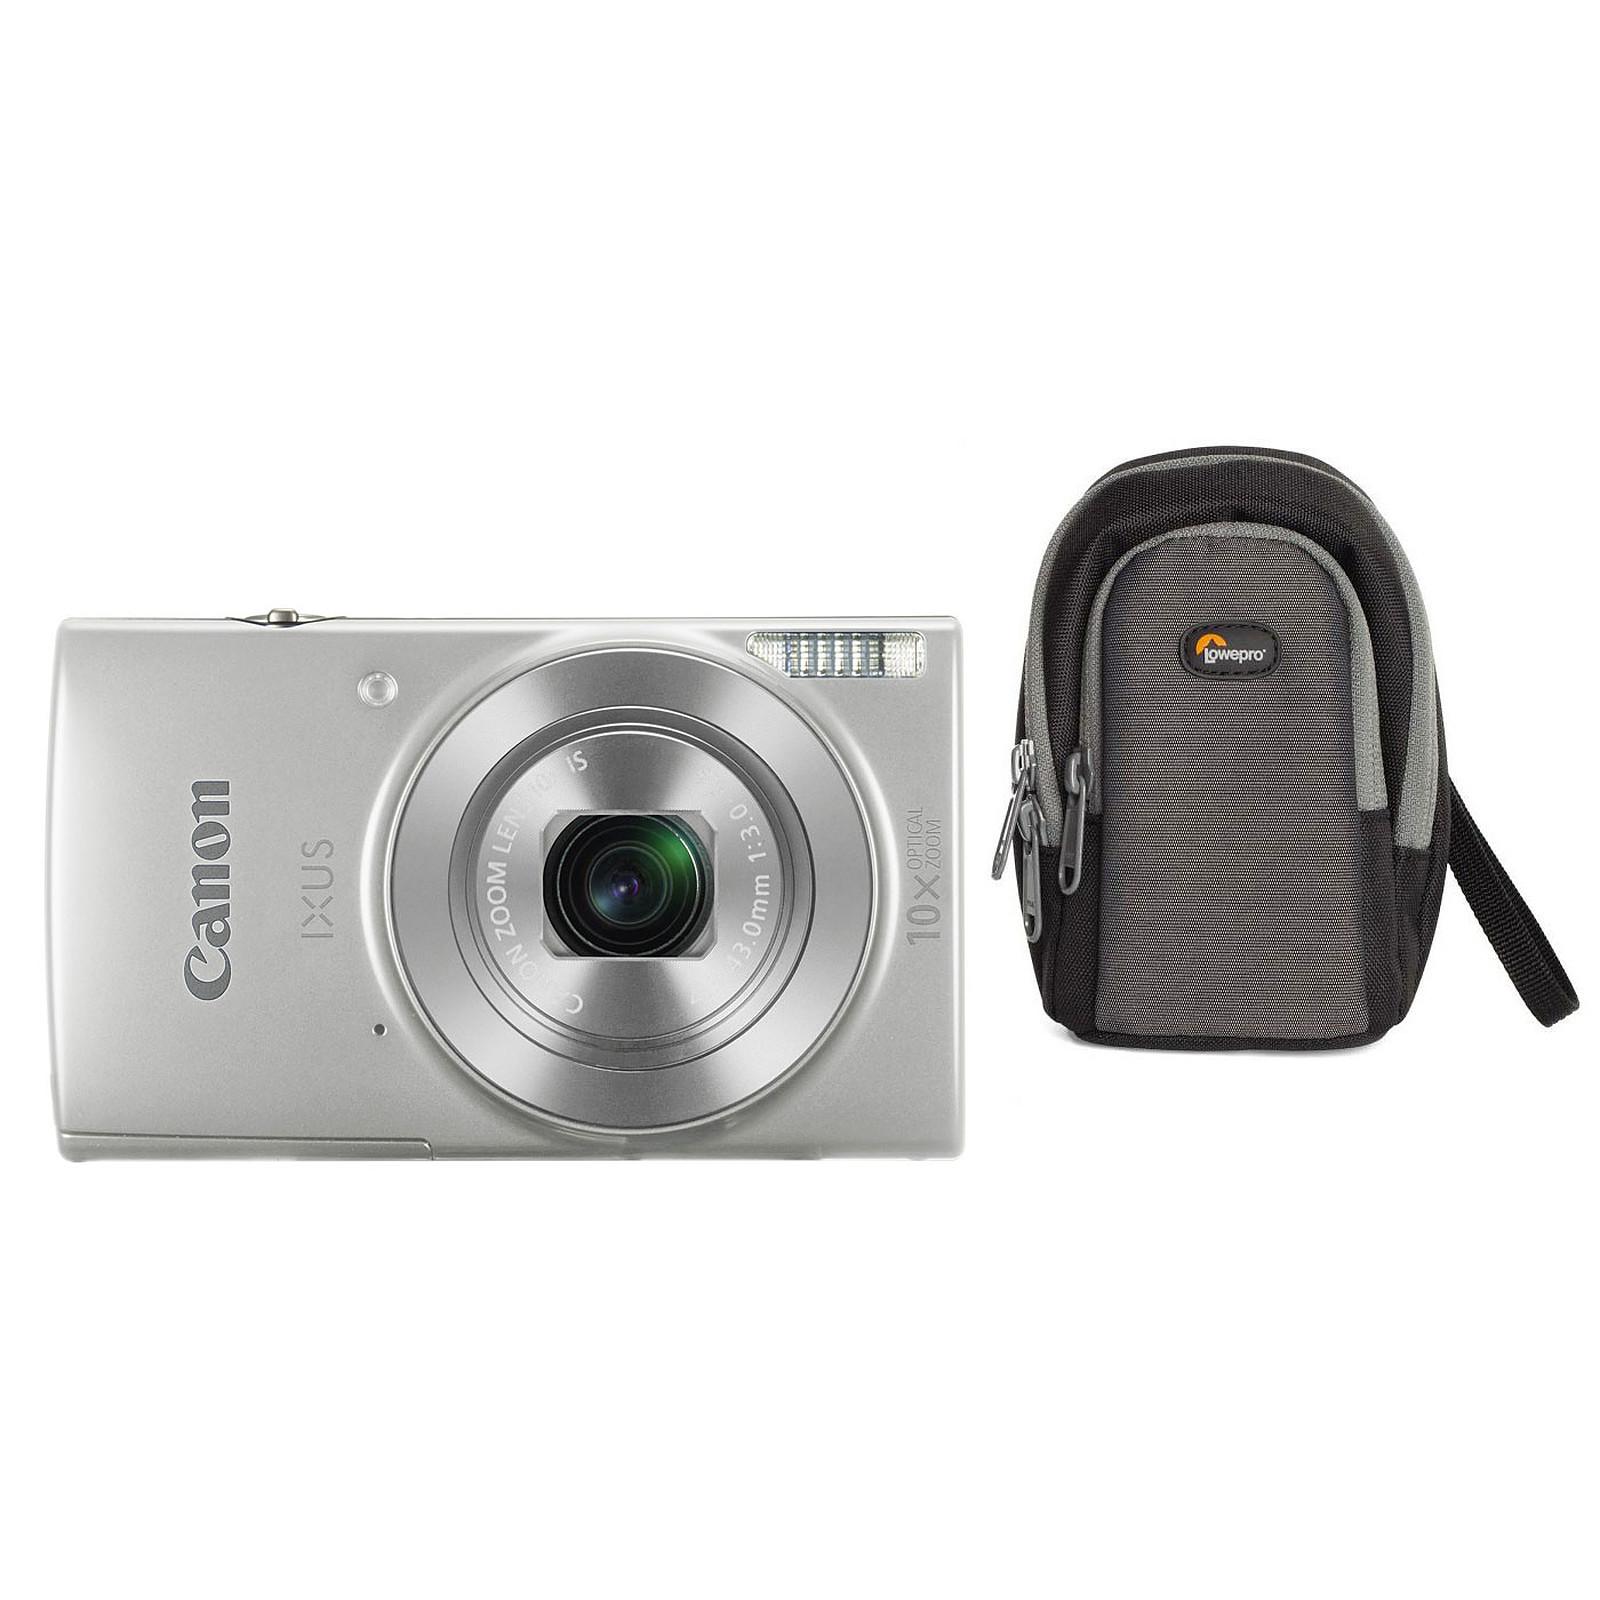 Canon IXUS 190 Argent + Lowepro Portland 30 Noir